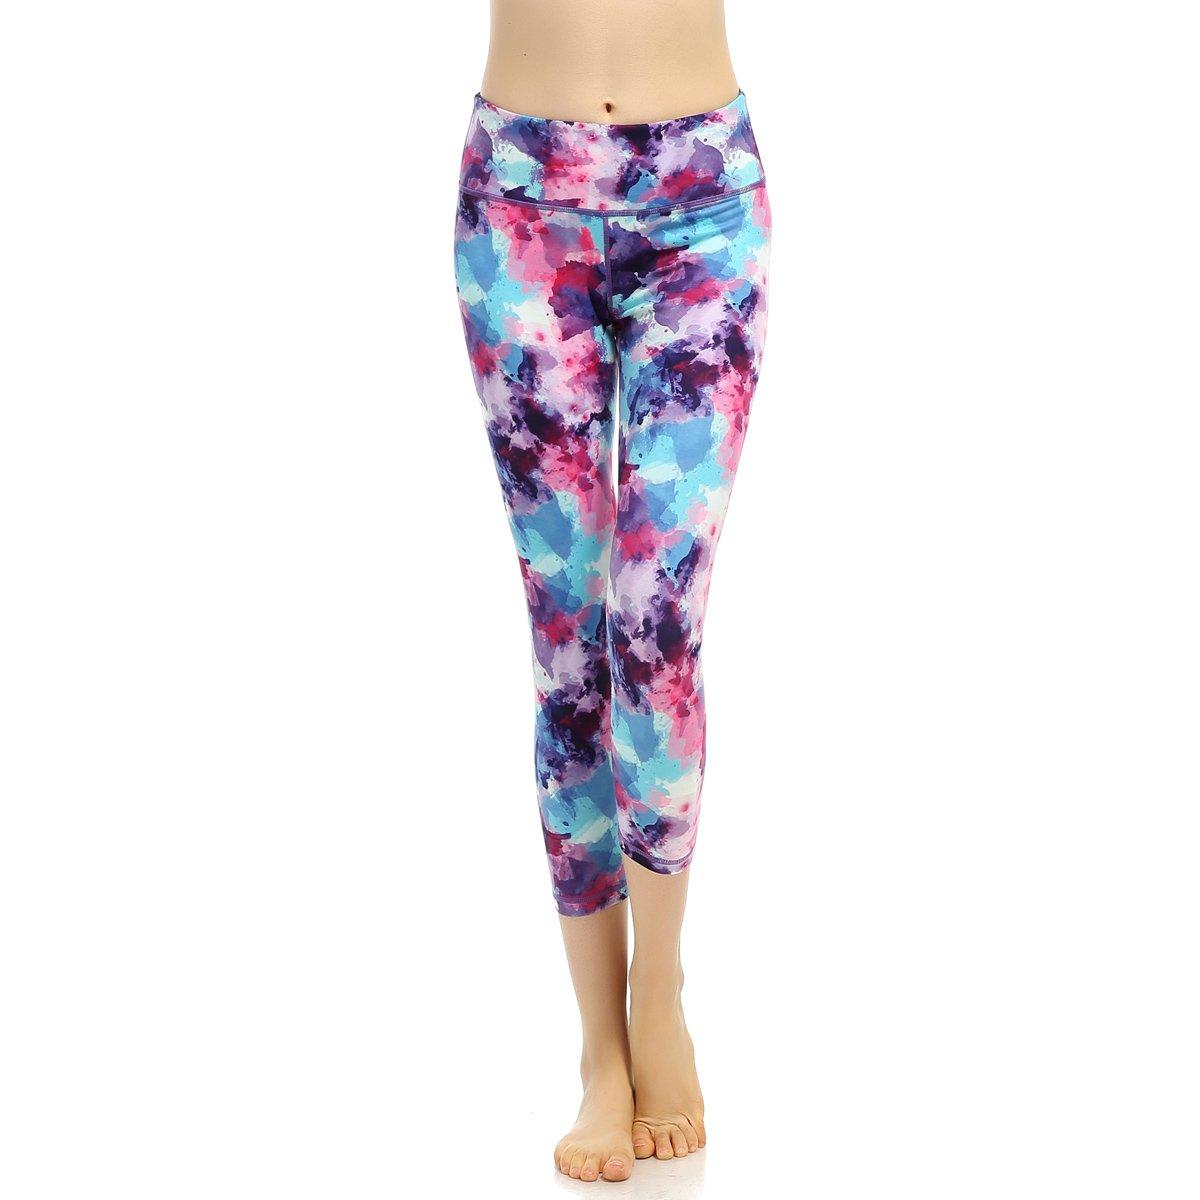 SOUTEAM Women's Workout Capri Pants Printed Active Yoga Leggings, Watercolor Pattern S170122229